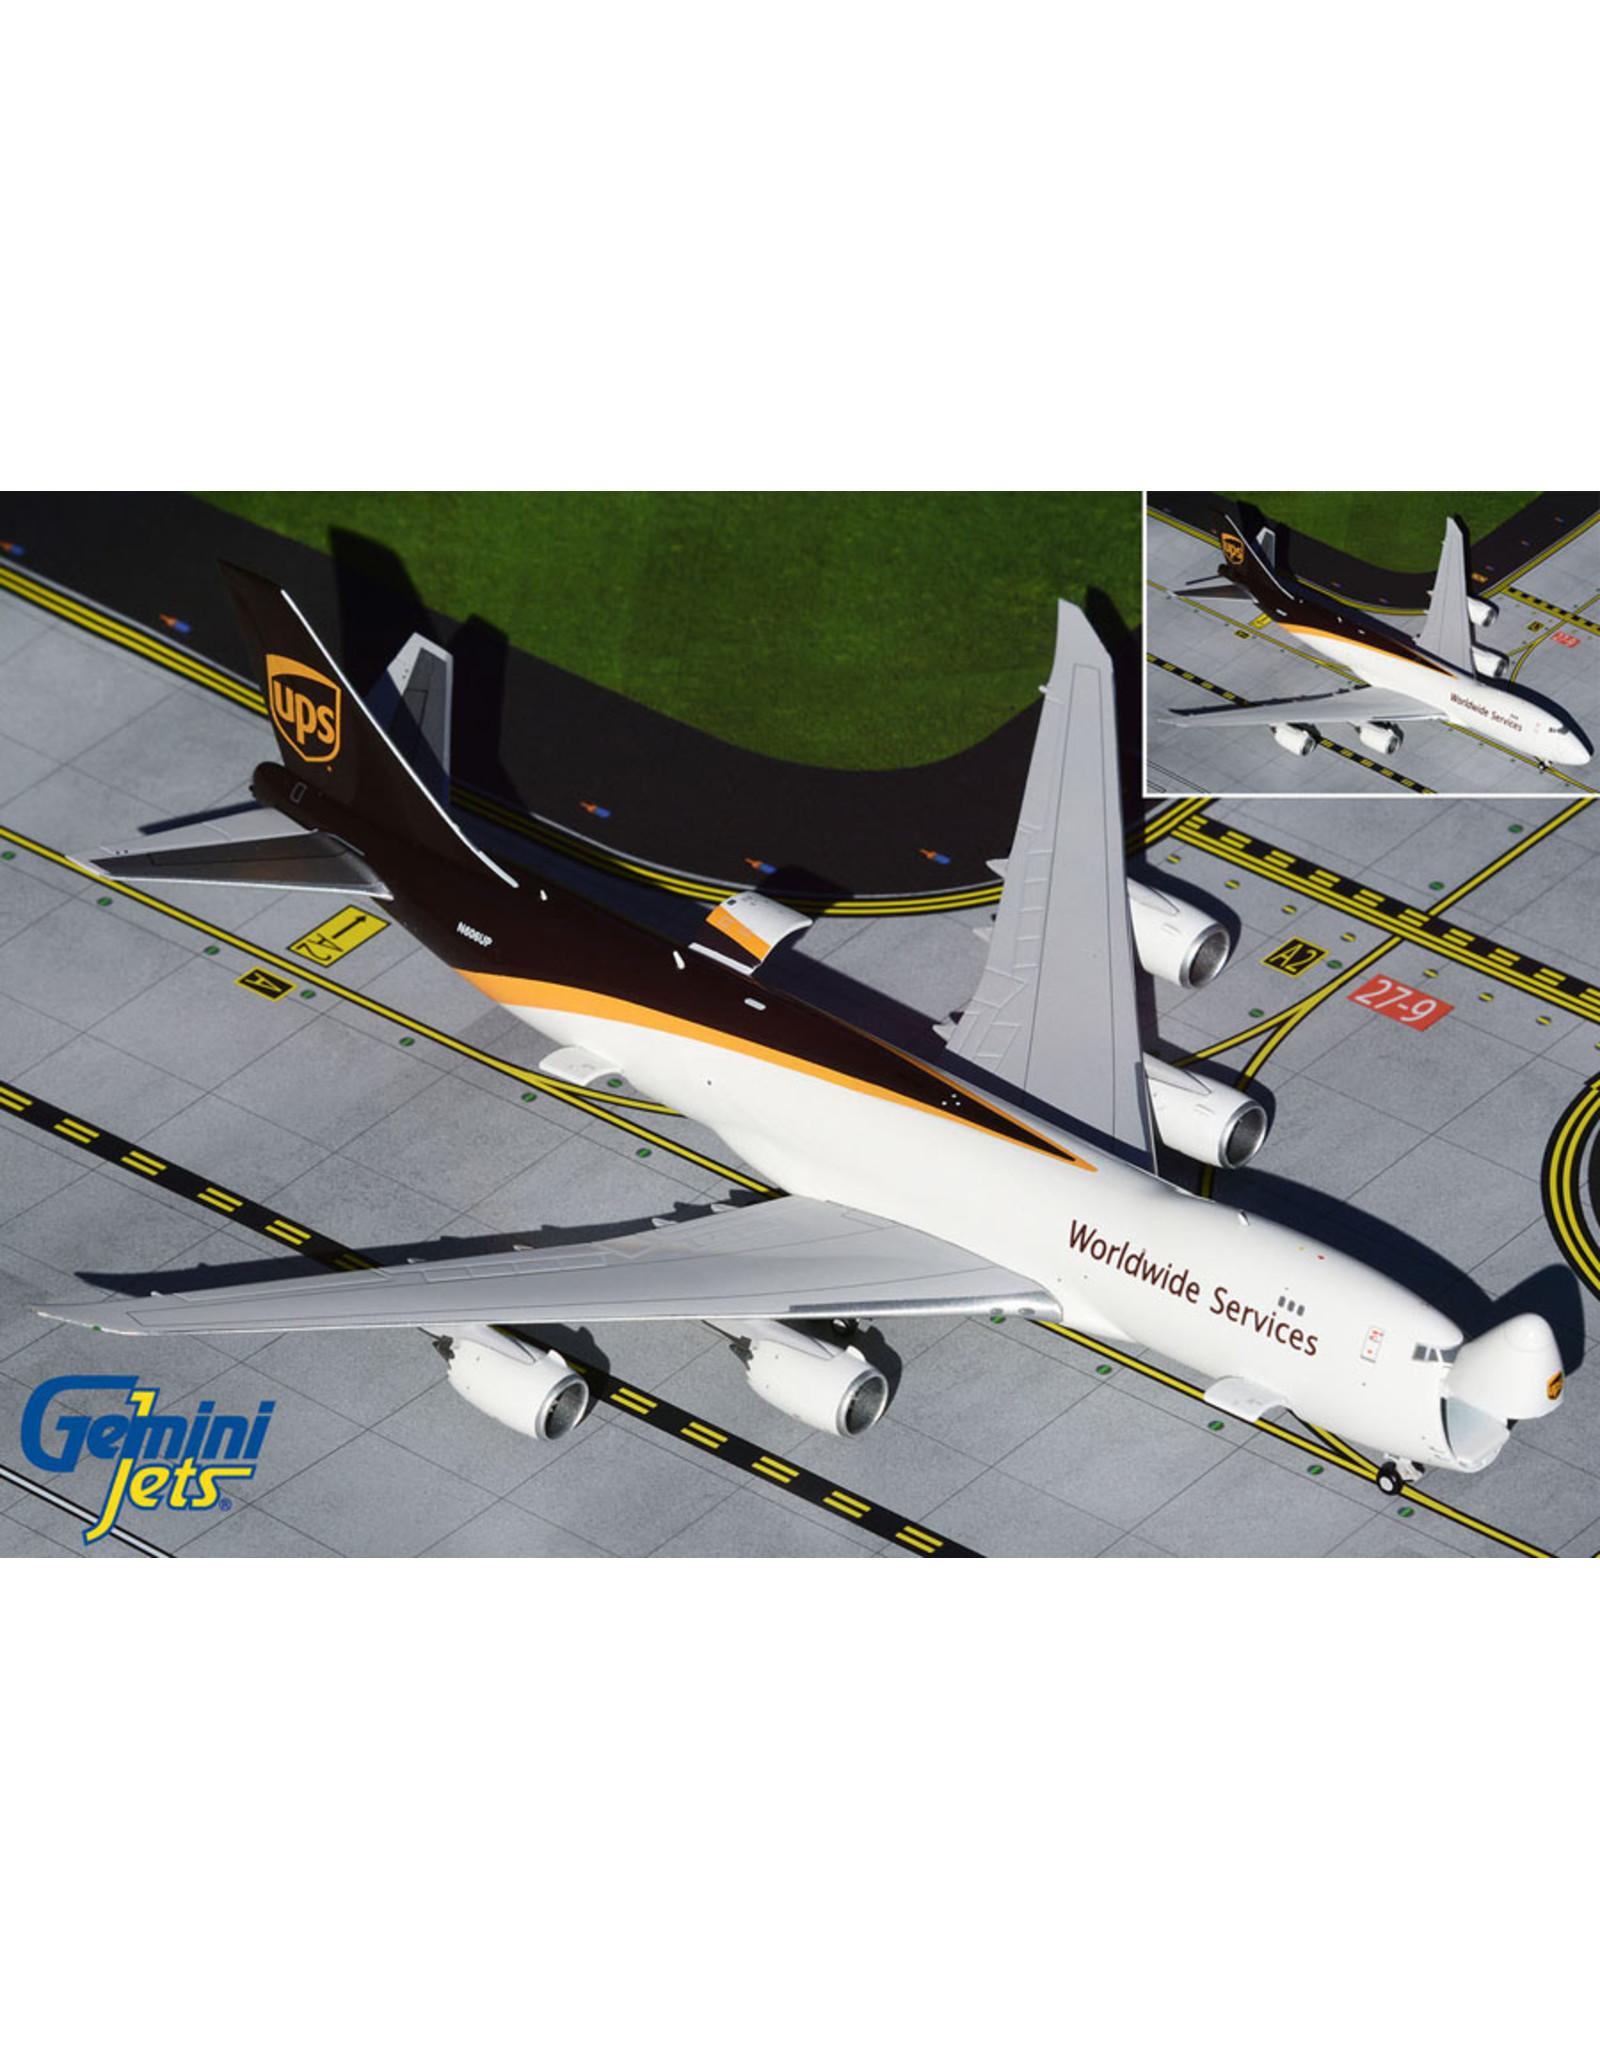 Gemini Gem4 UPS 747-8F interactive